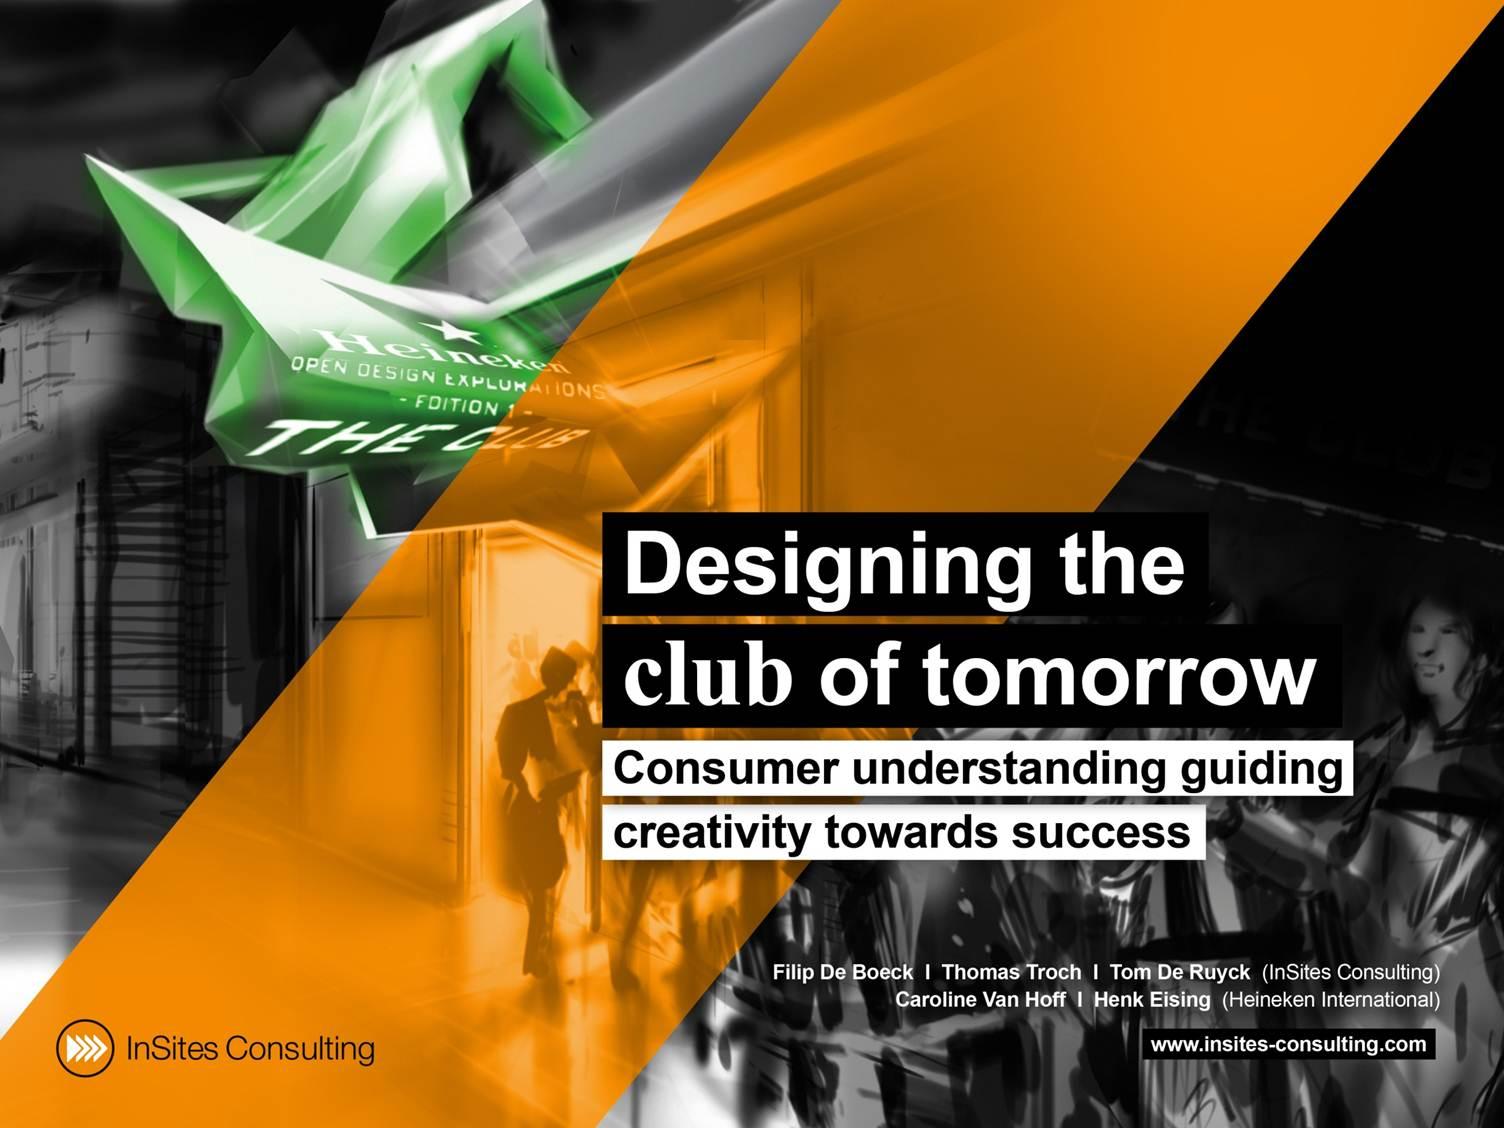 Designing the club of tomorrow